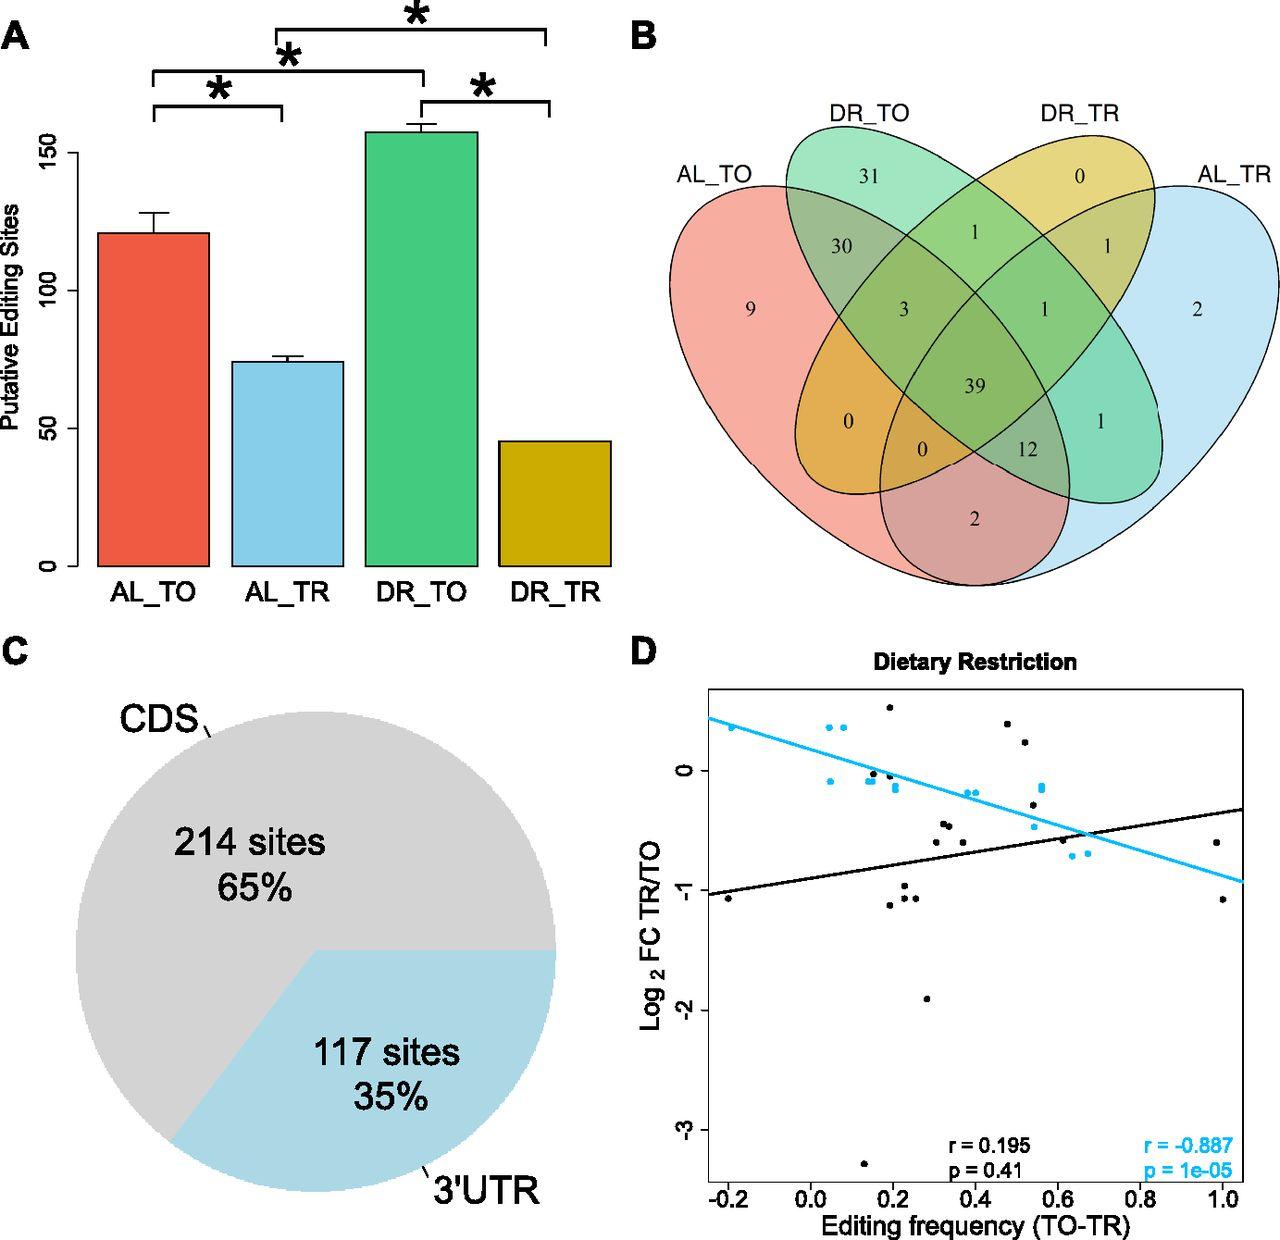 Dietary restriction induces posttranscriptional regulation